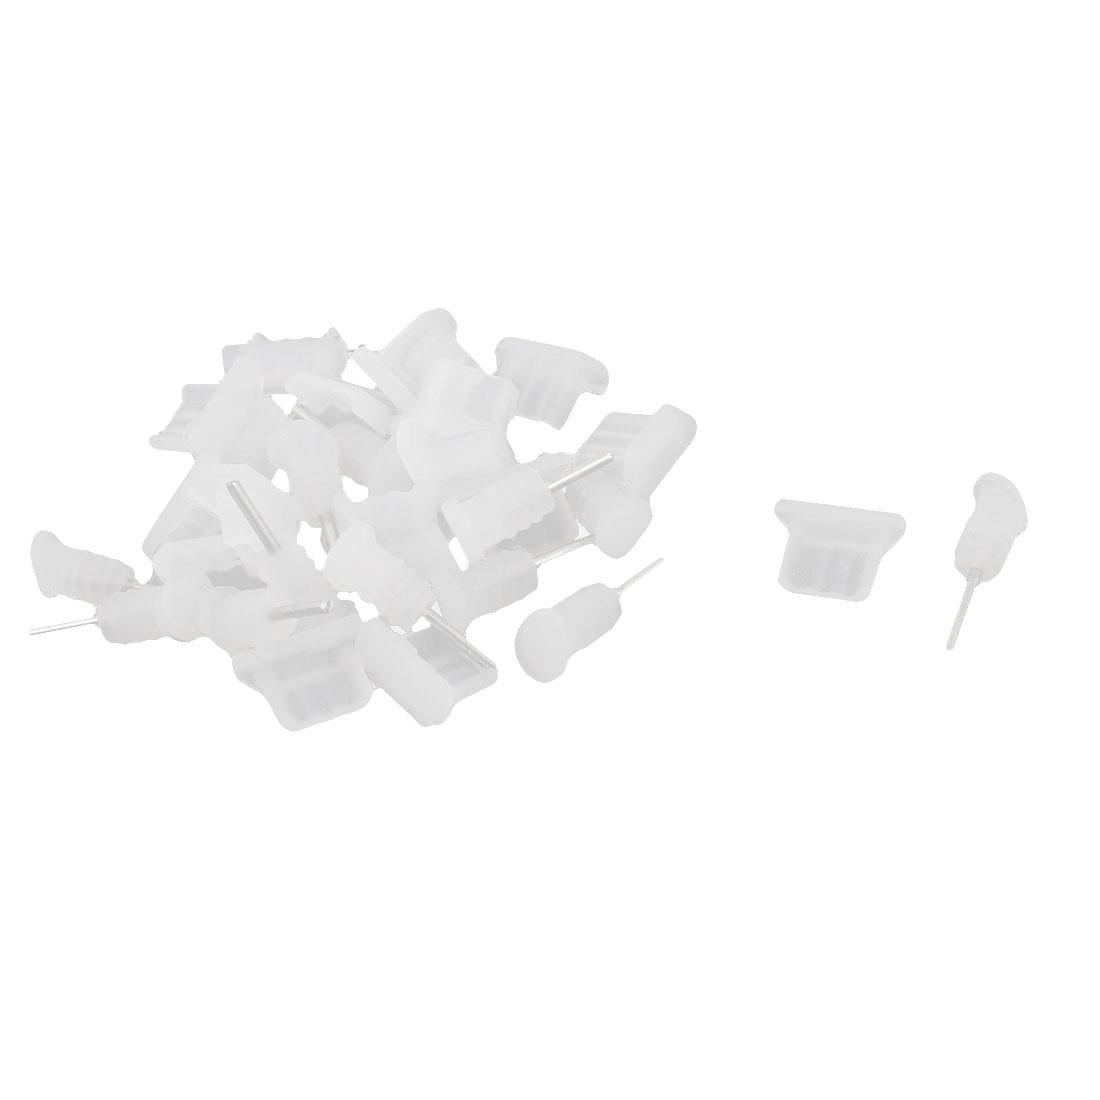 15 Pcs Clear White 3.5mm Micro USB Earphone Dust-proof Cap Stopper